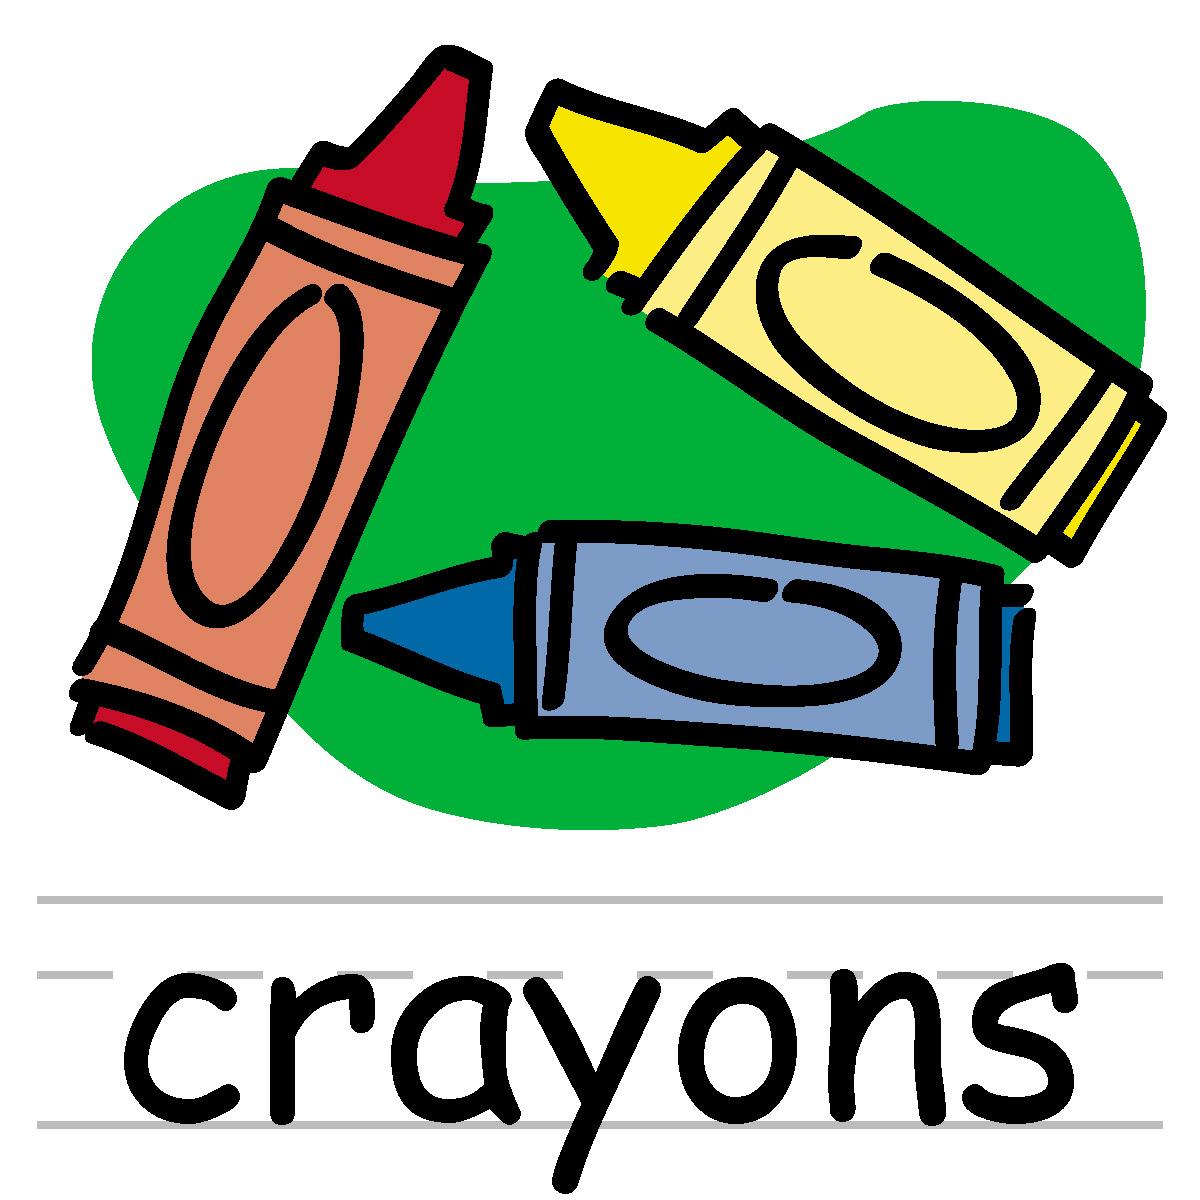 crayon clip art | Clipart Panda - Free Clipart Images